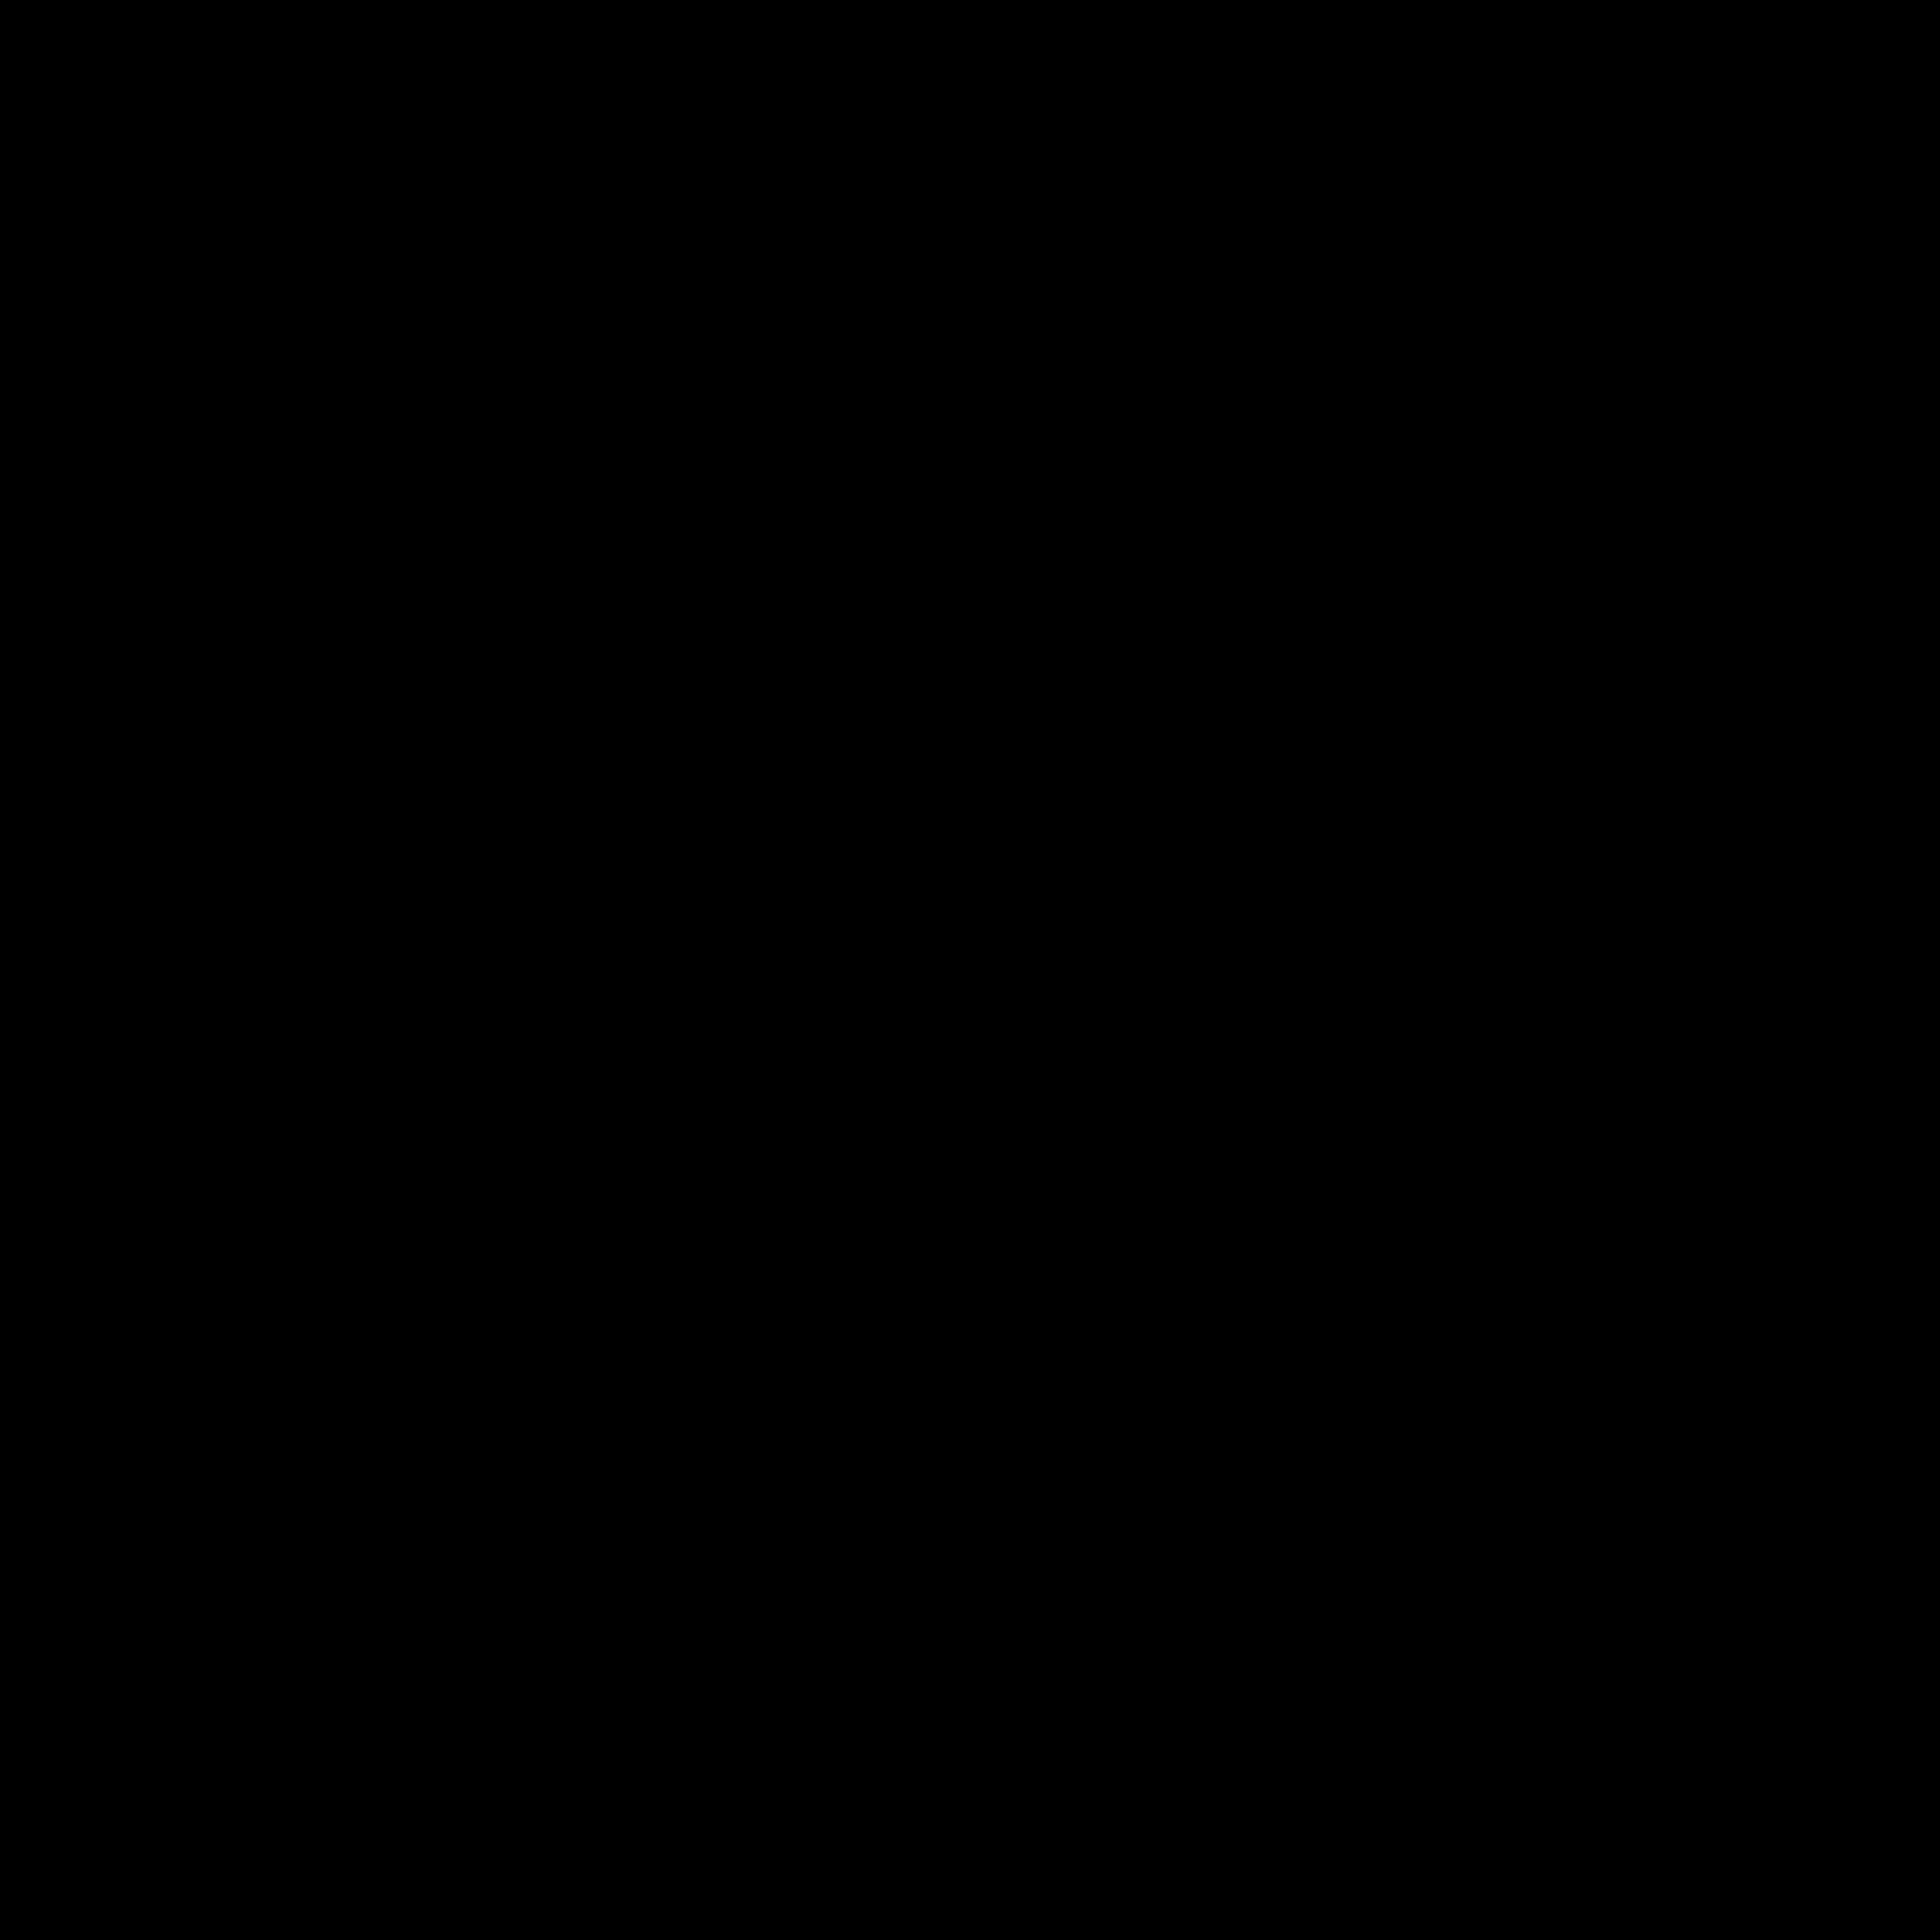 Lord & Taylor Logo PNG Transparent & SVG Vector.